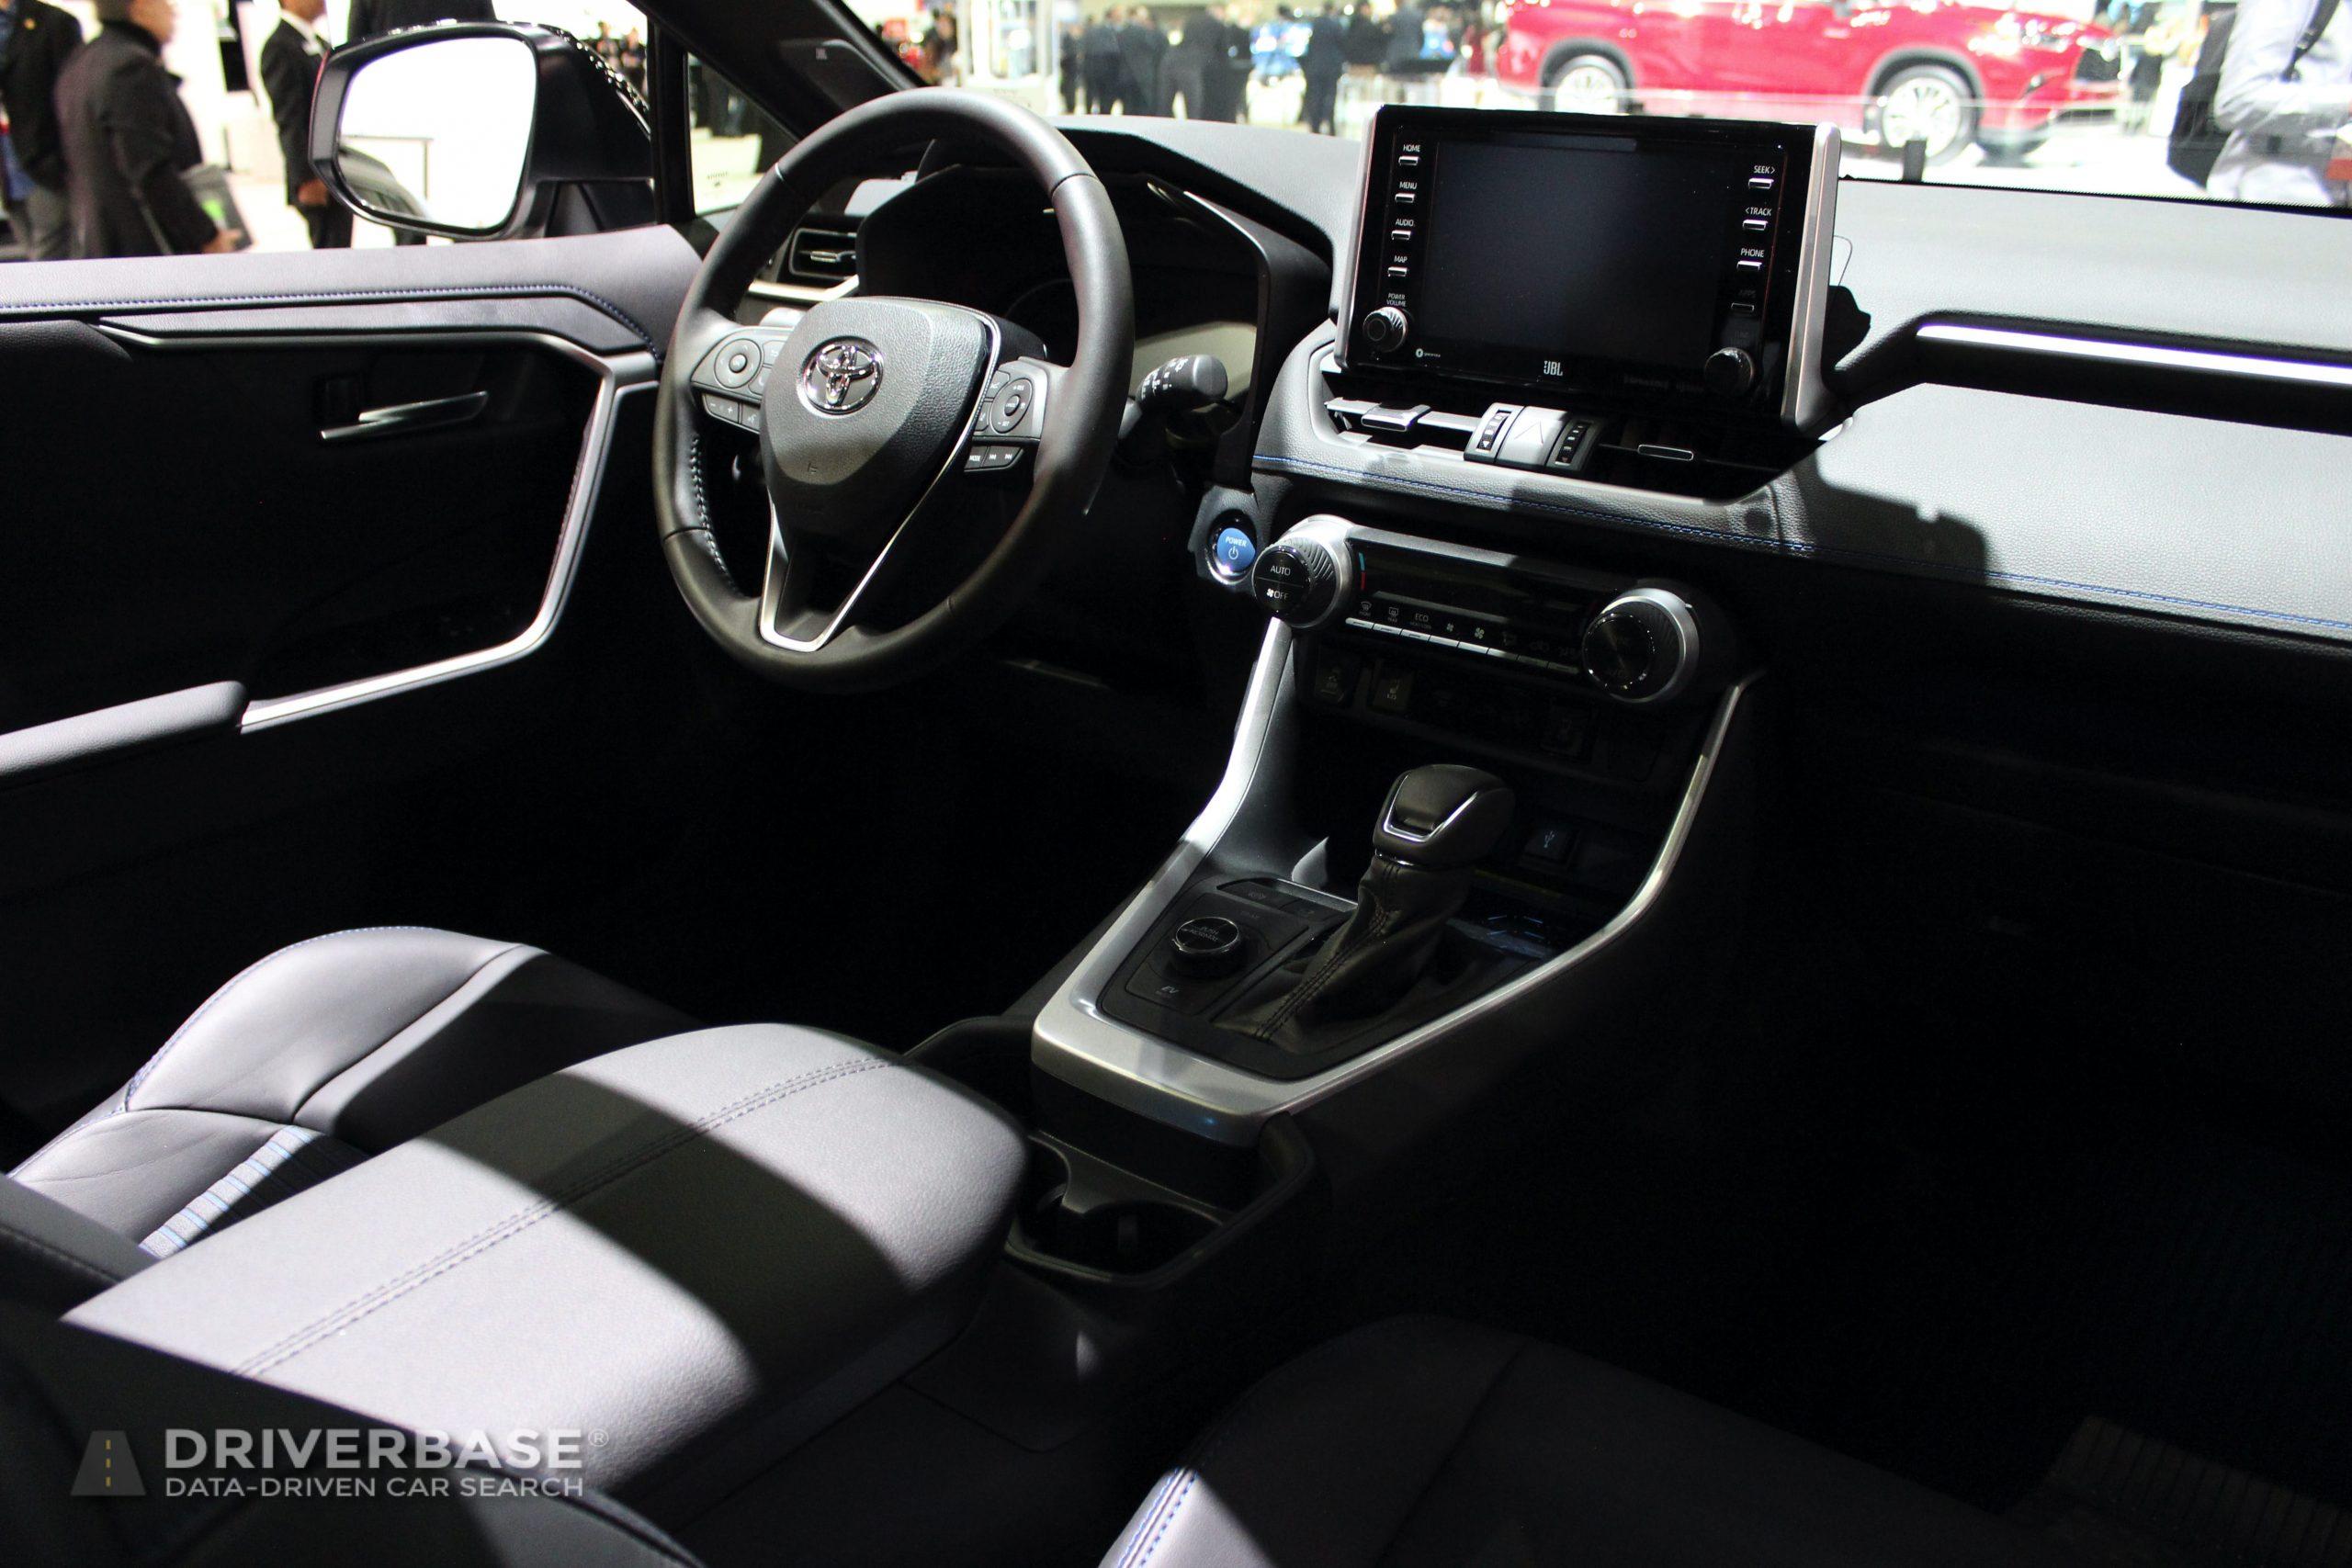 2020 Toyota RAV4 XSE Hybrid at the Los Angeles Auto Show